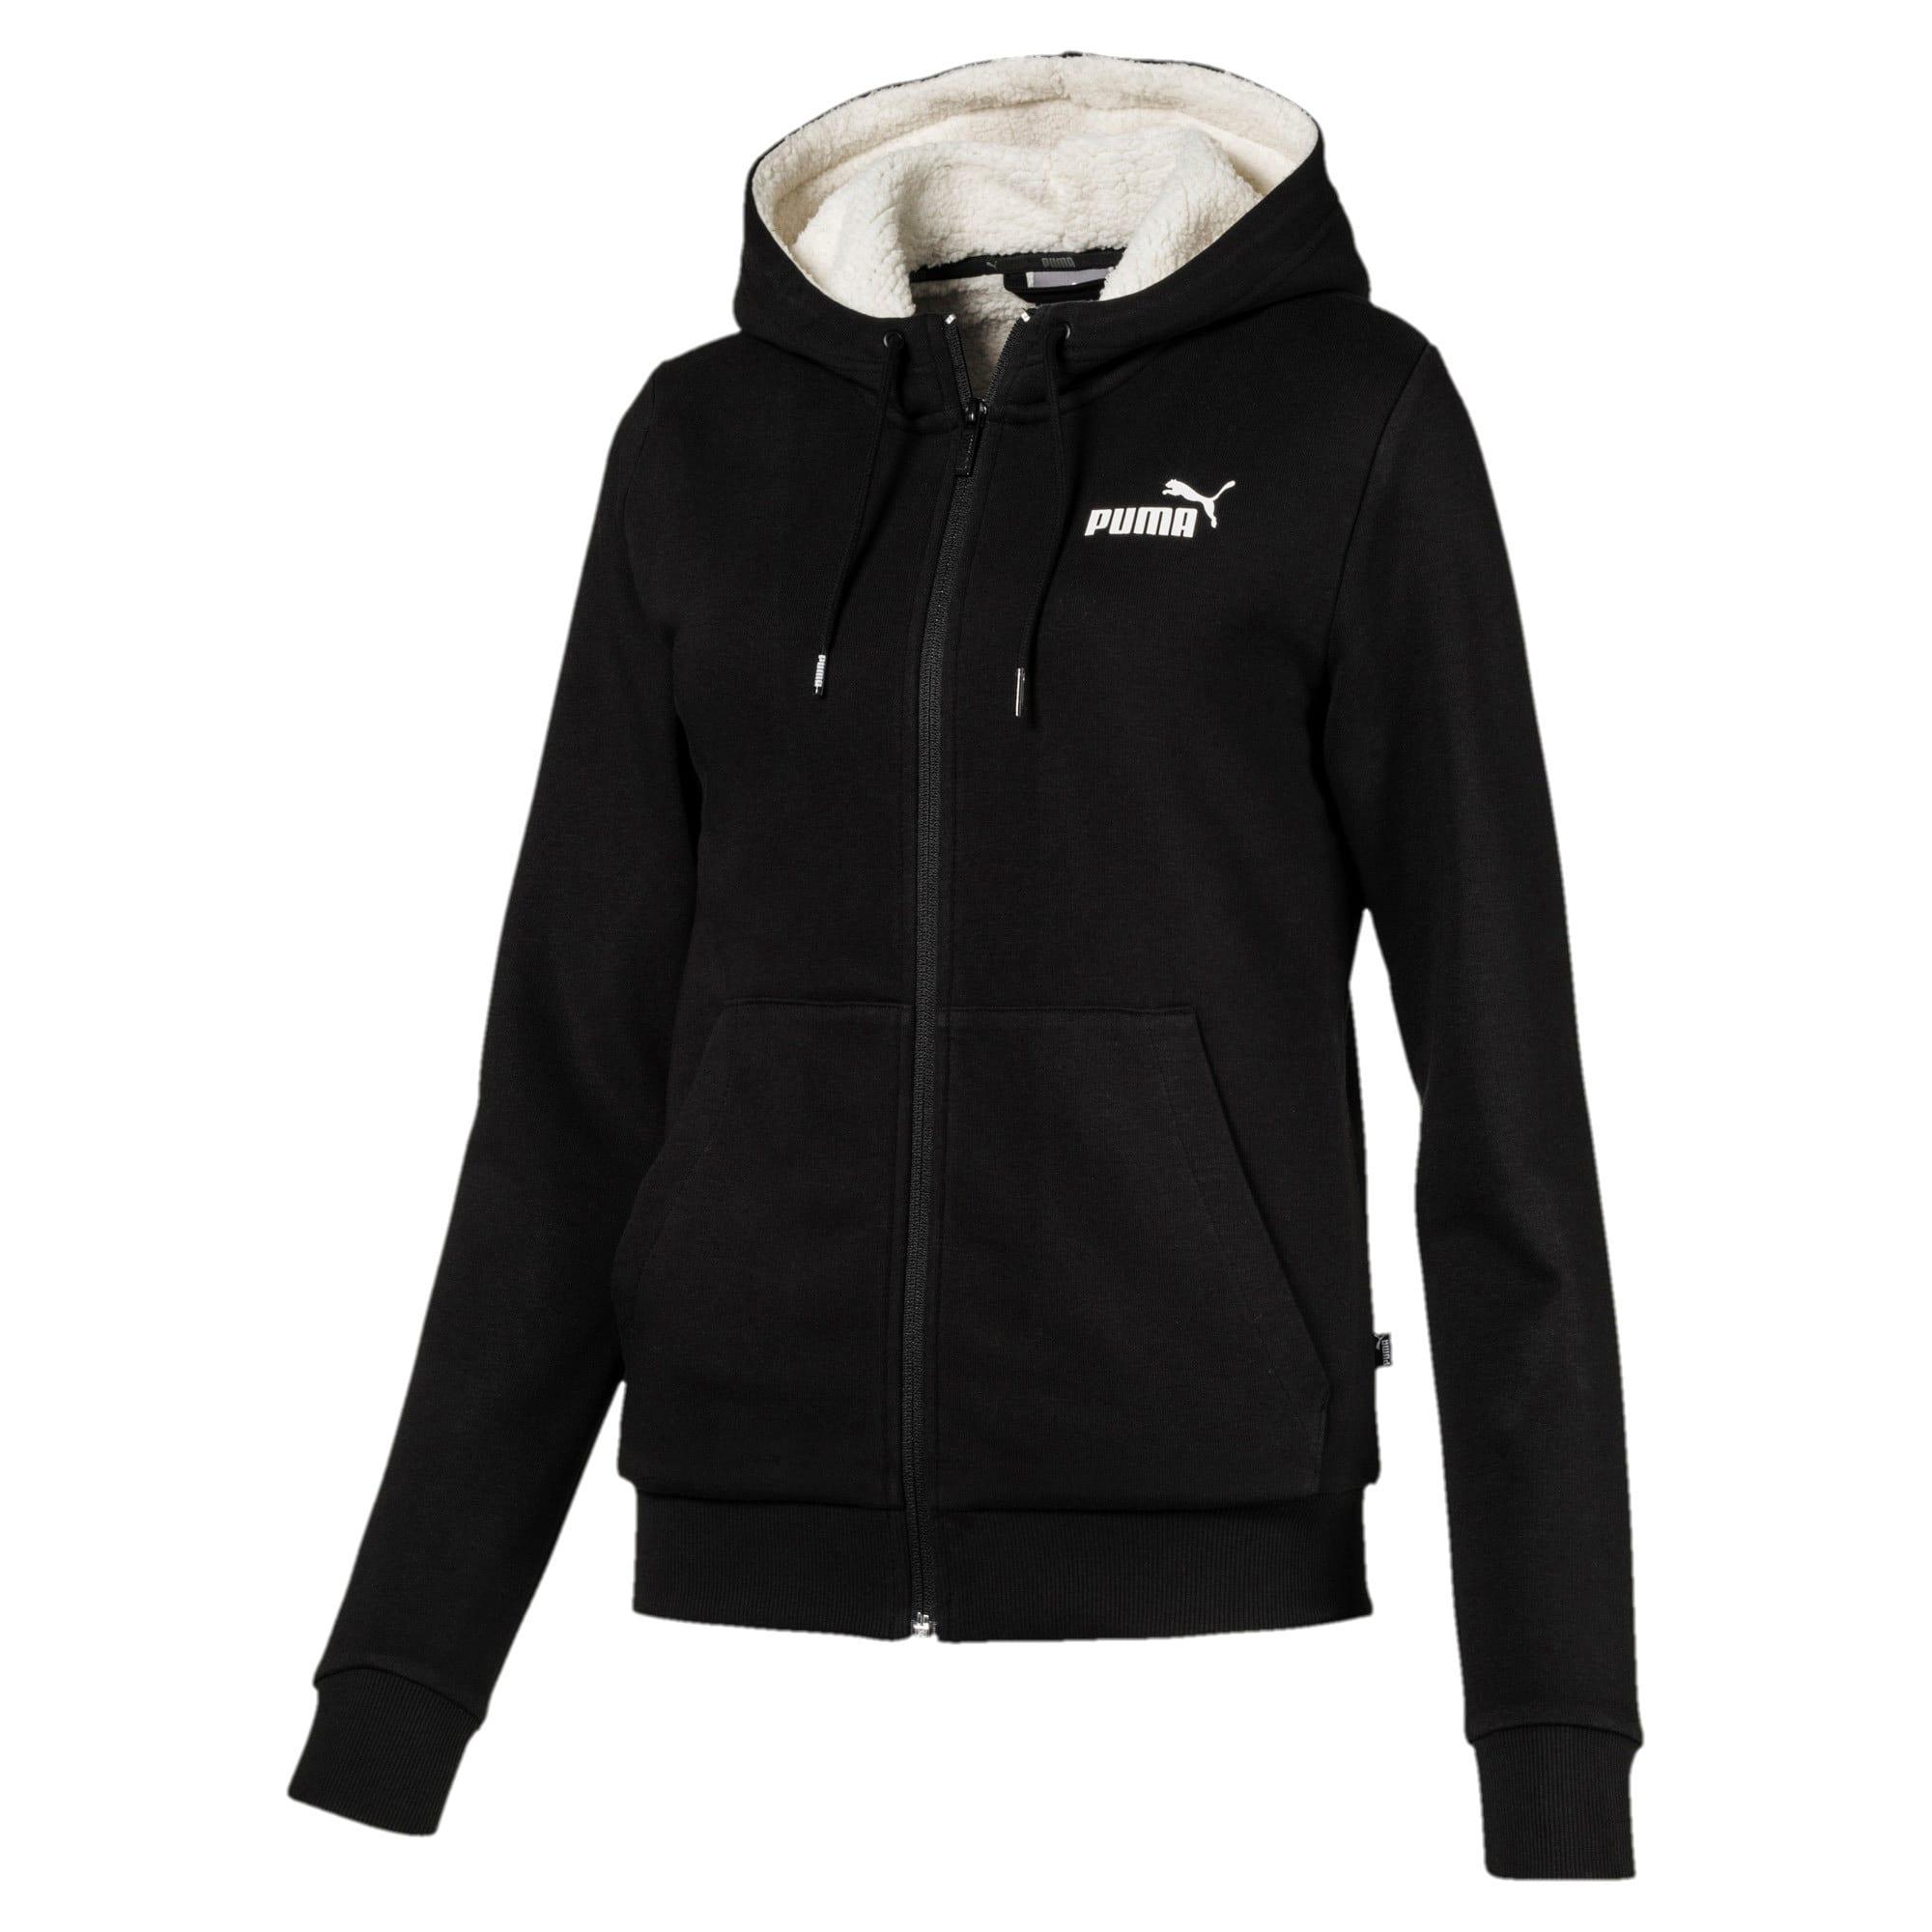 Miniatura 4 de Chaqueta con capucha Essentials + Sherpa para mujer, Cotton Black, mediano